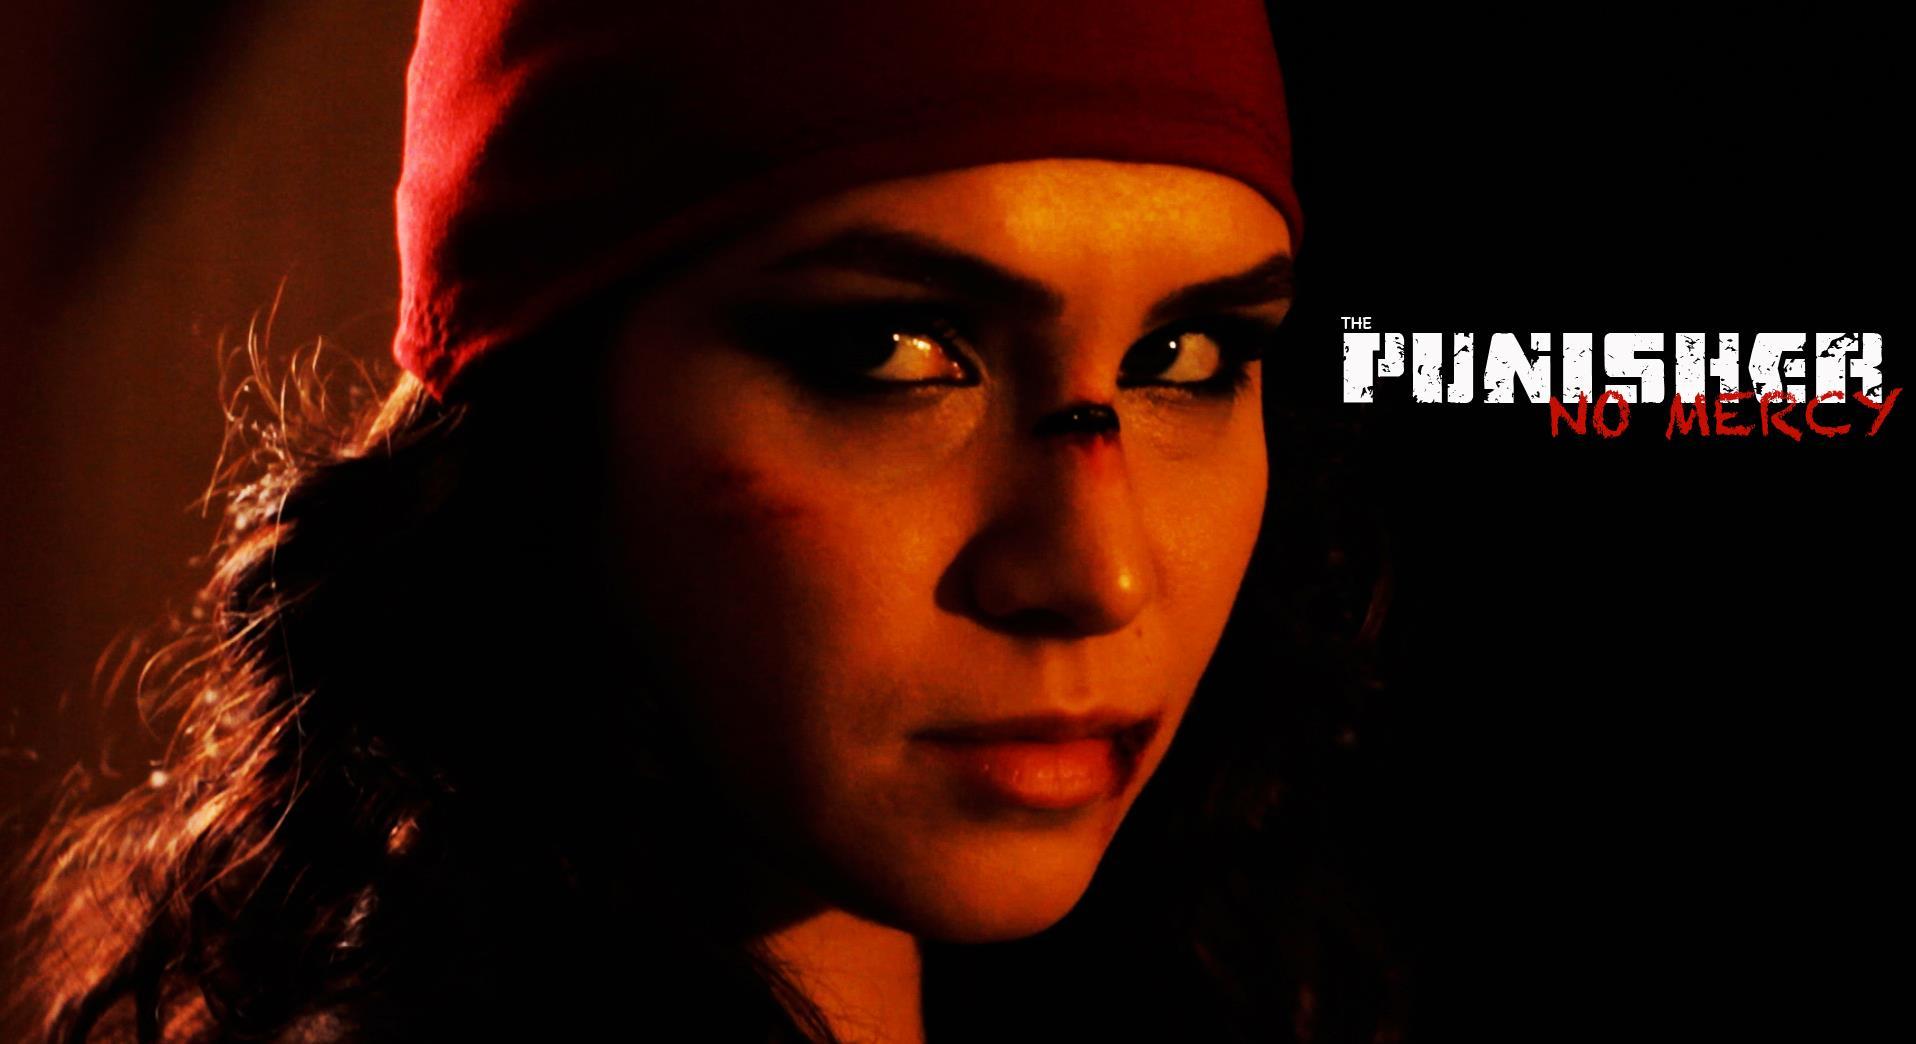 Amber - The Punisher: No Mercy